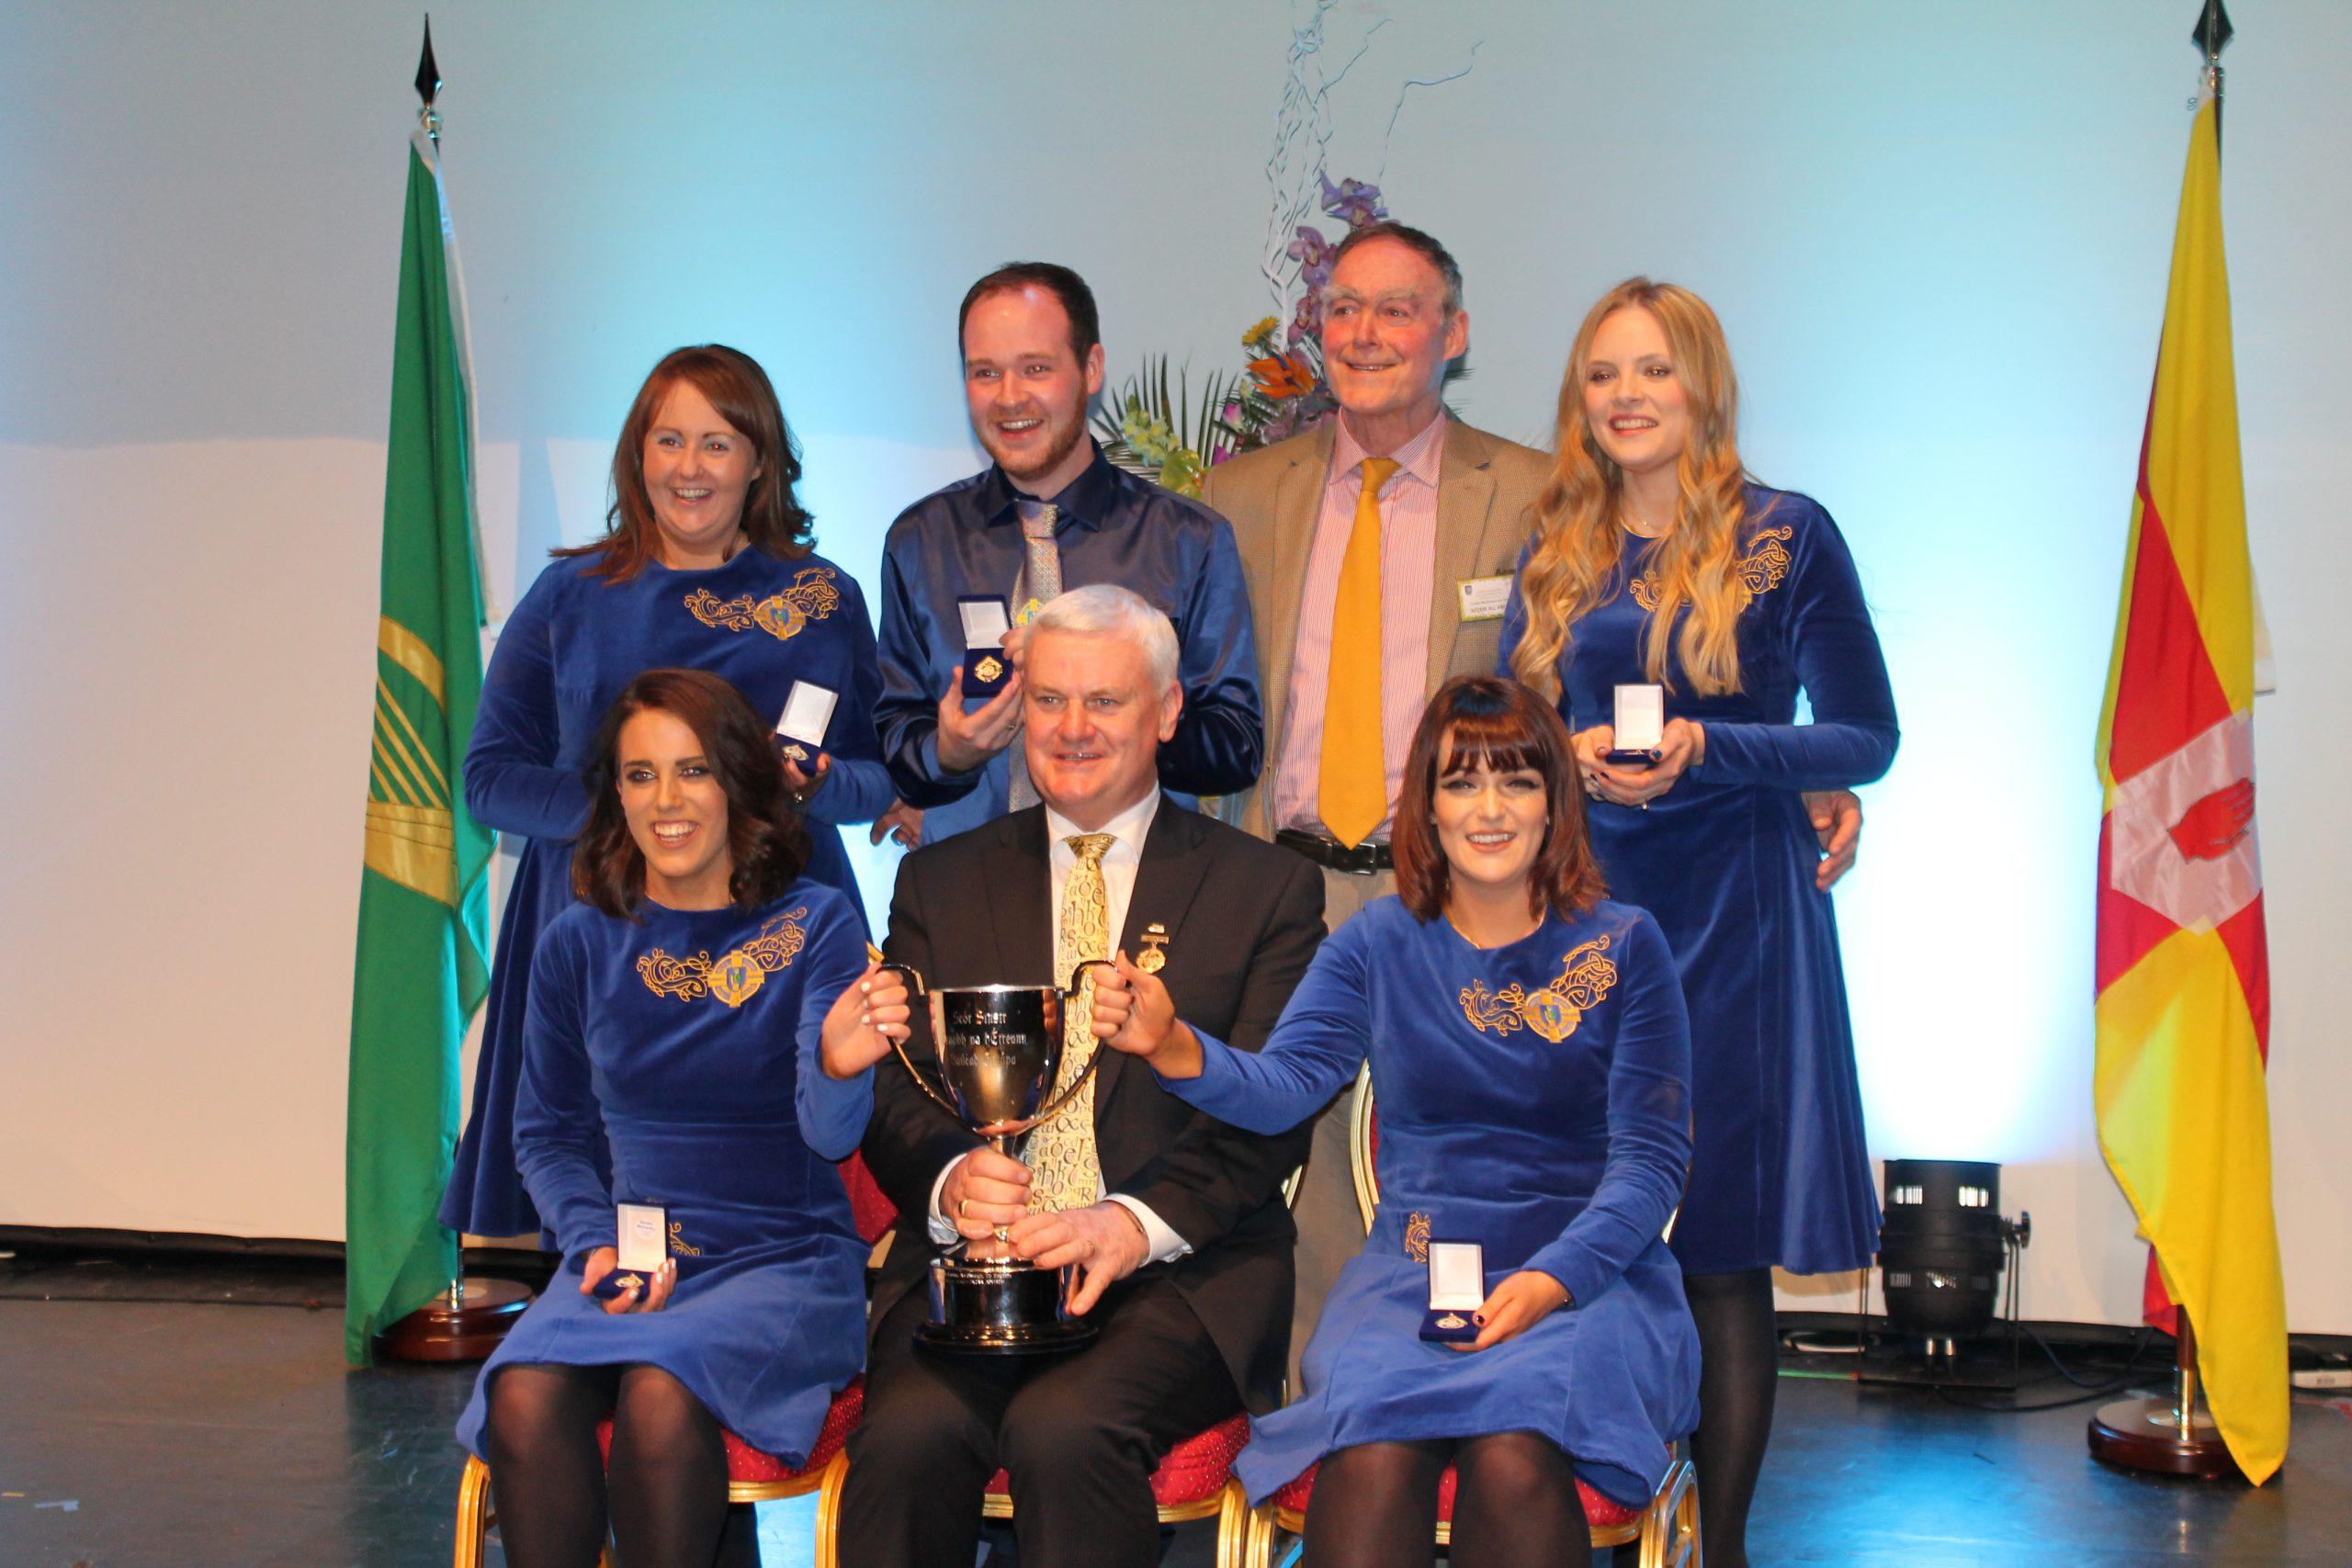 Ulster Winners at All-Ireland Scór Sinsear Finals 2016